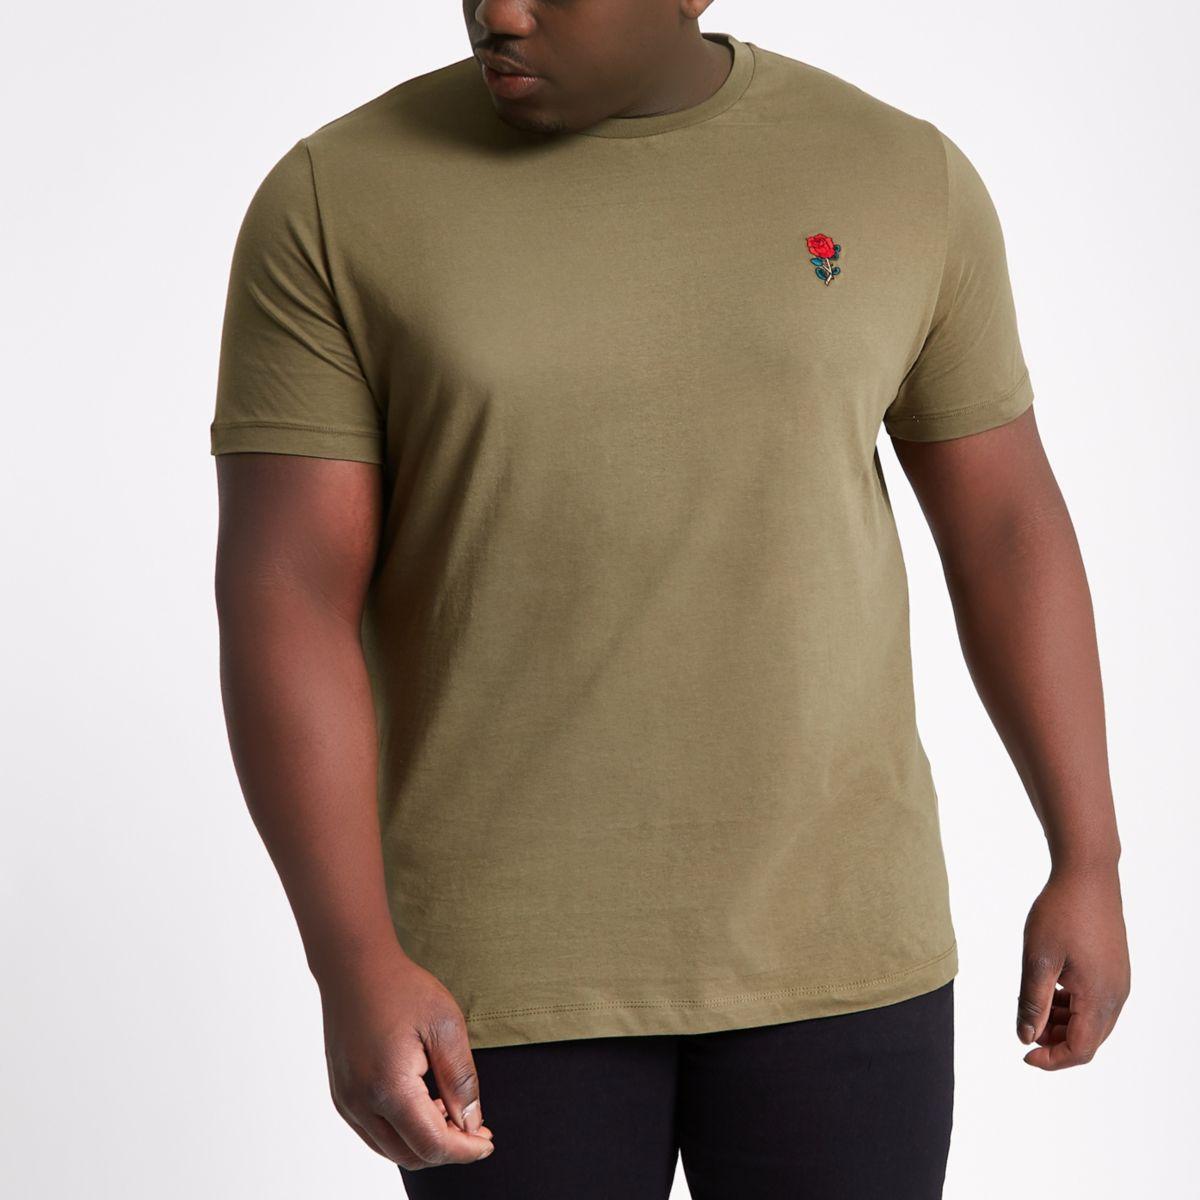 RI Big and Tall - Donkergroen T-shirt met borduursel